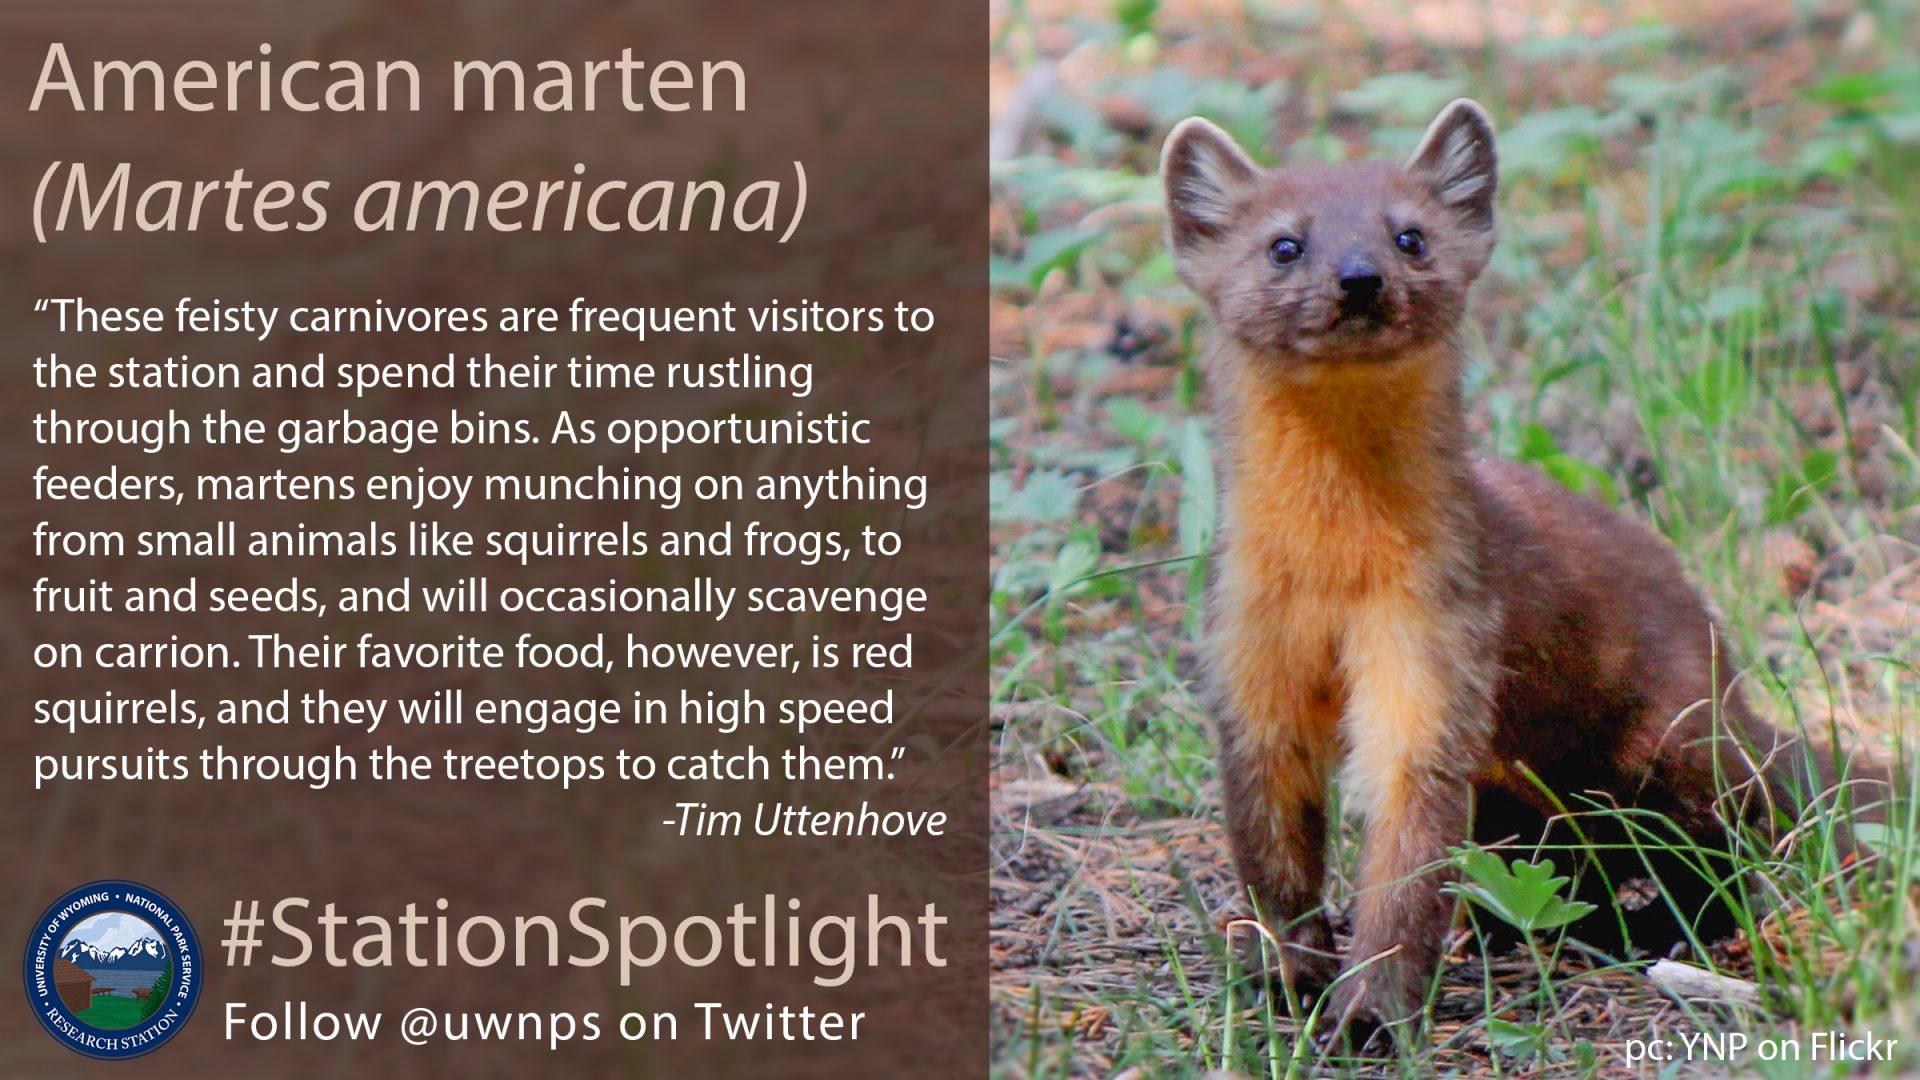 Pine marten looks up, curious